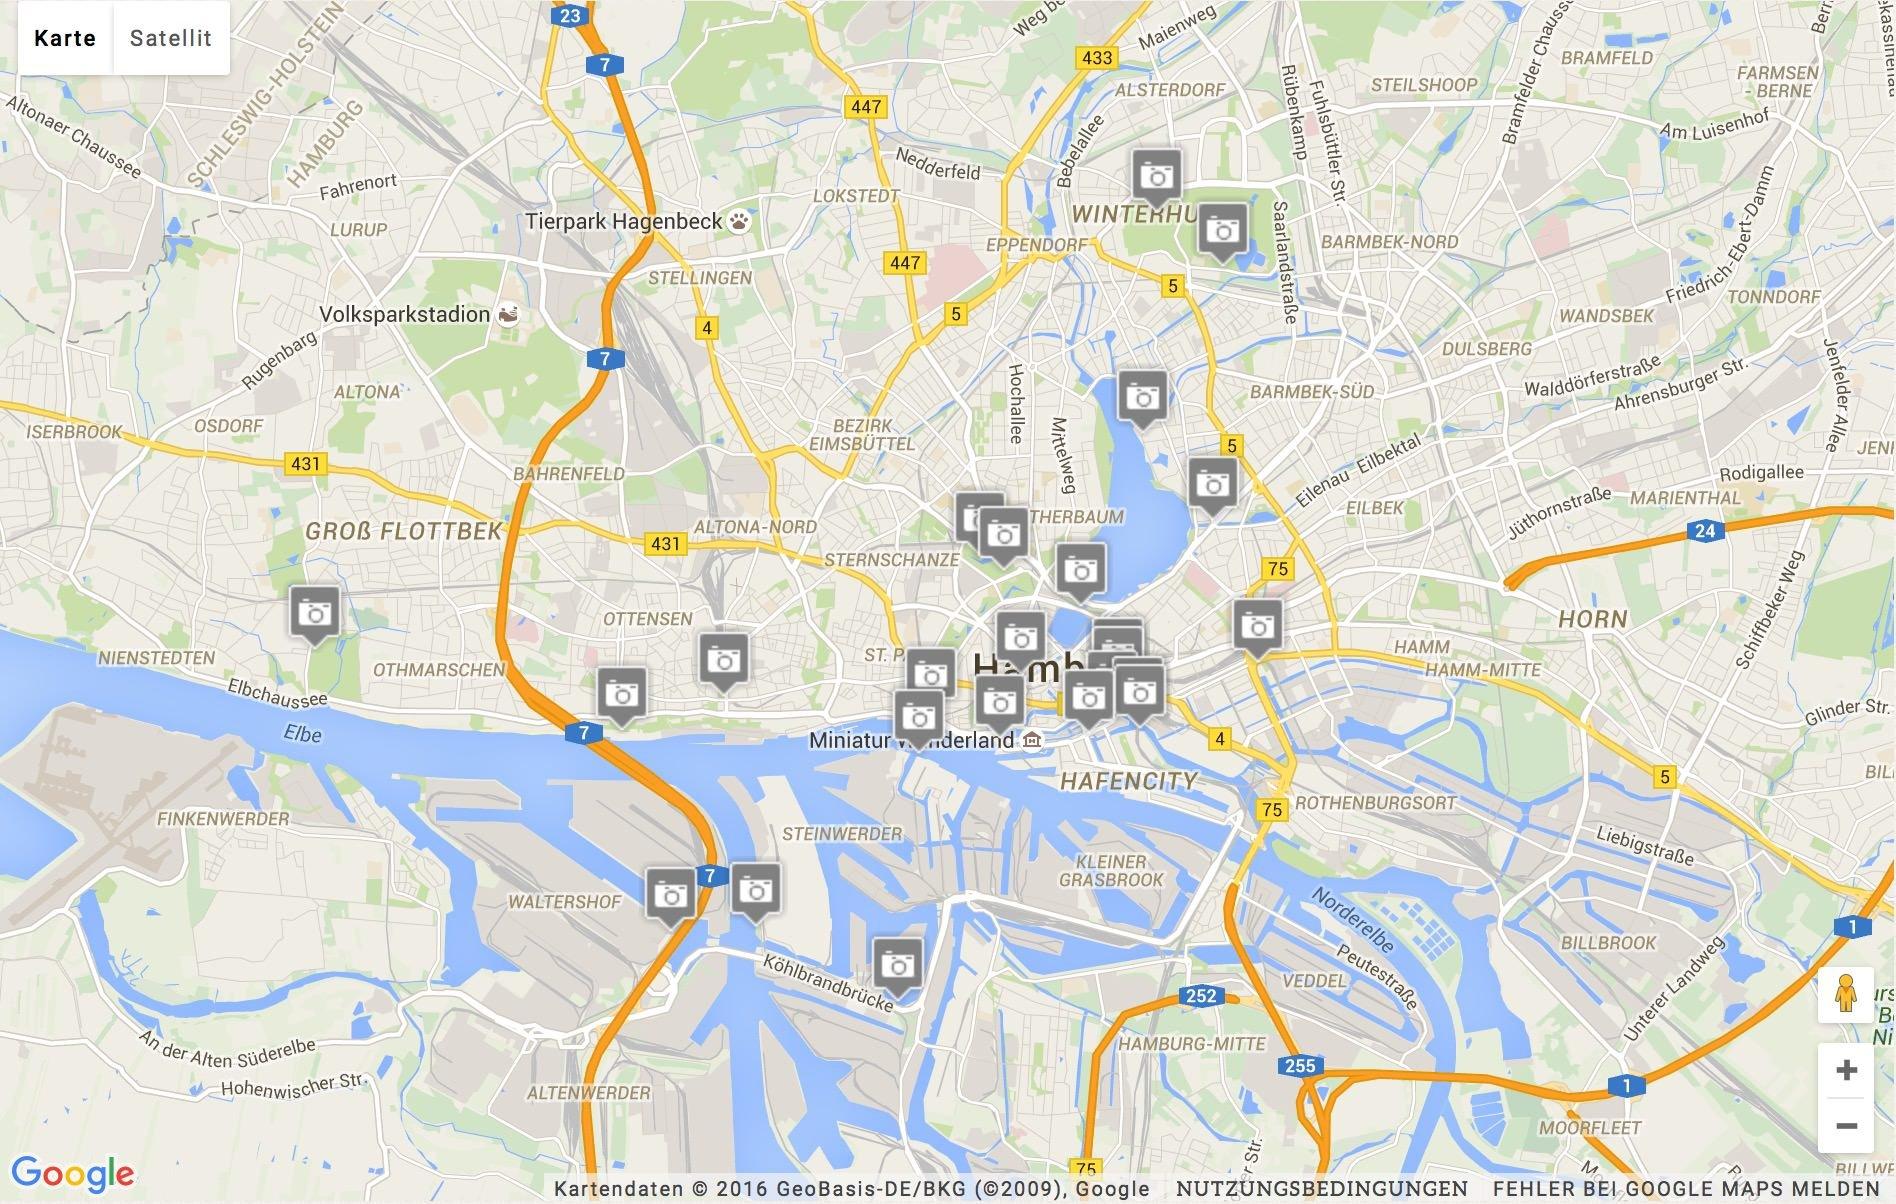 Hamburg Karte Sehenswurdigkeiten.Karte Archive Andreas Kreutzer Fotografie